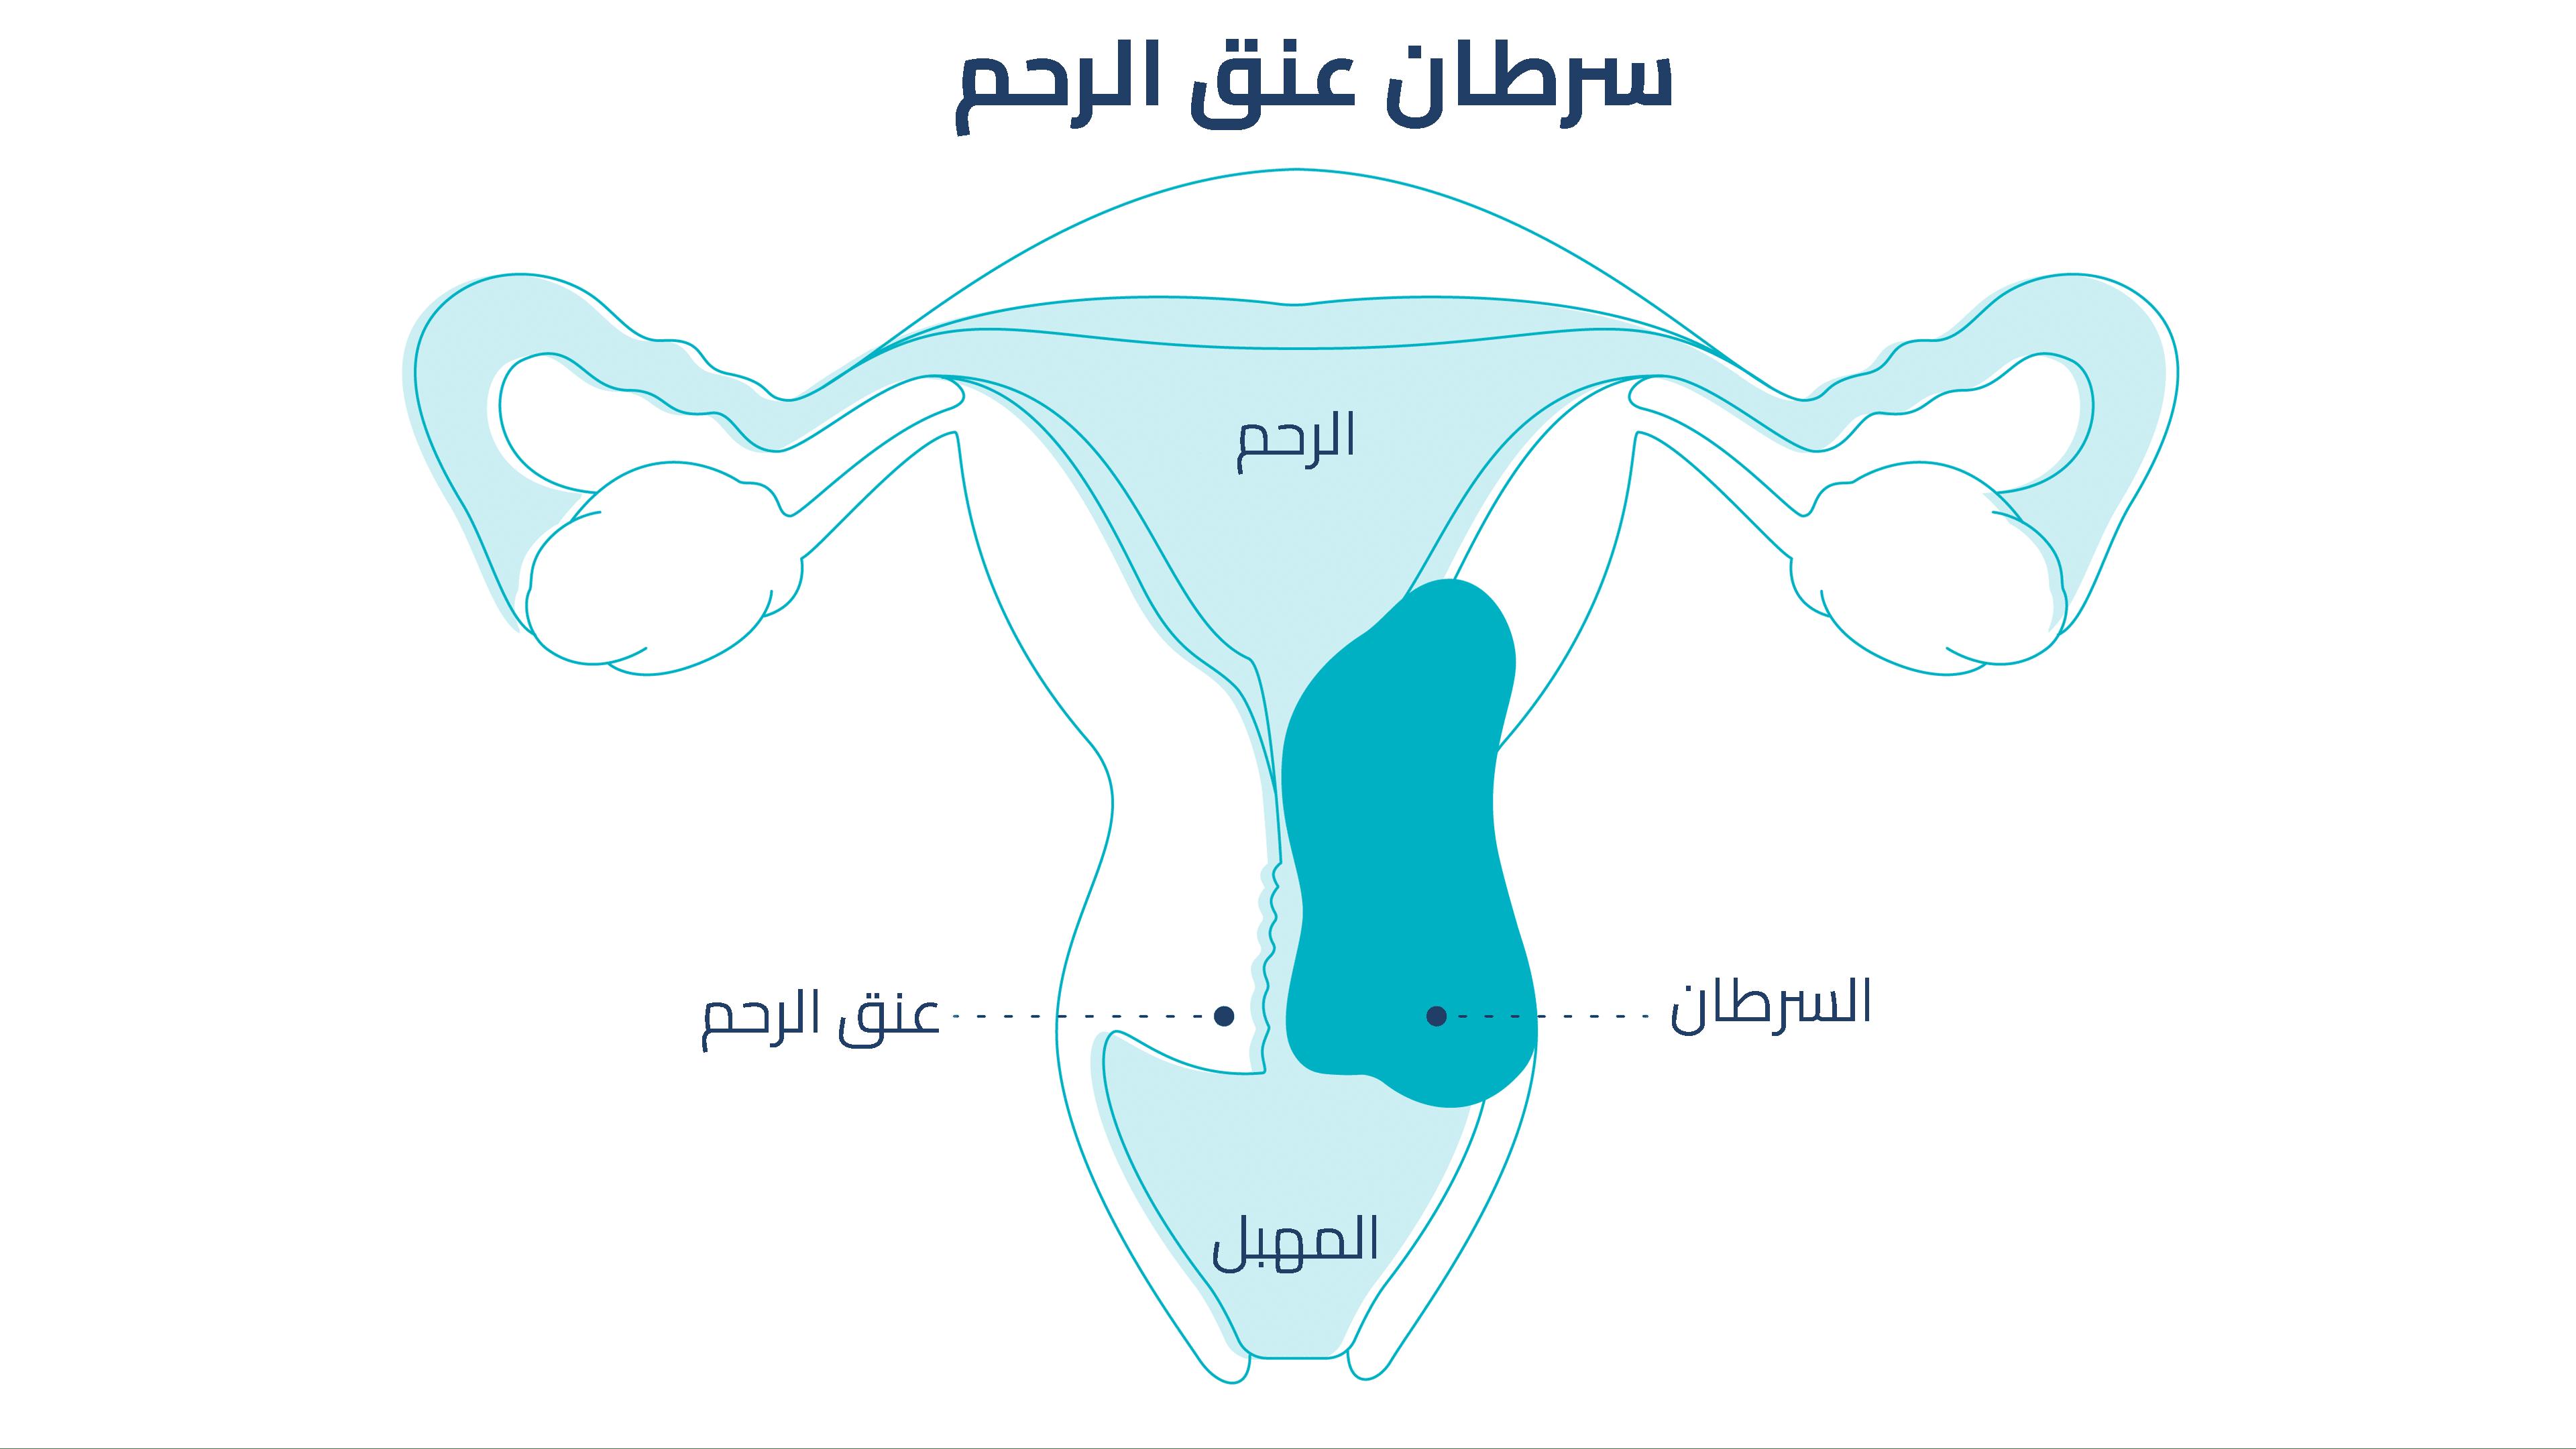 Photo of سرطان عنق الرحم أسبابه وأعراضه وطرق الوقاية والعلاج، ملف شامل